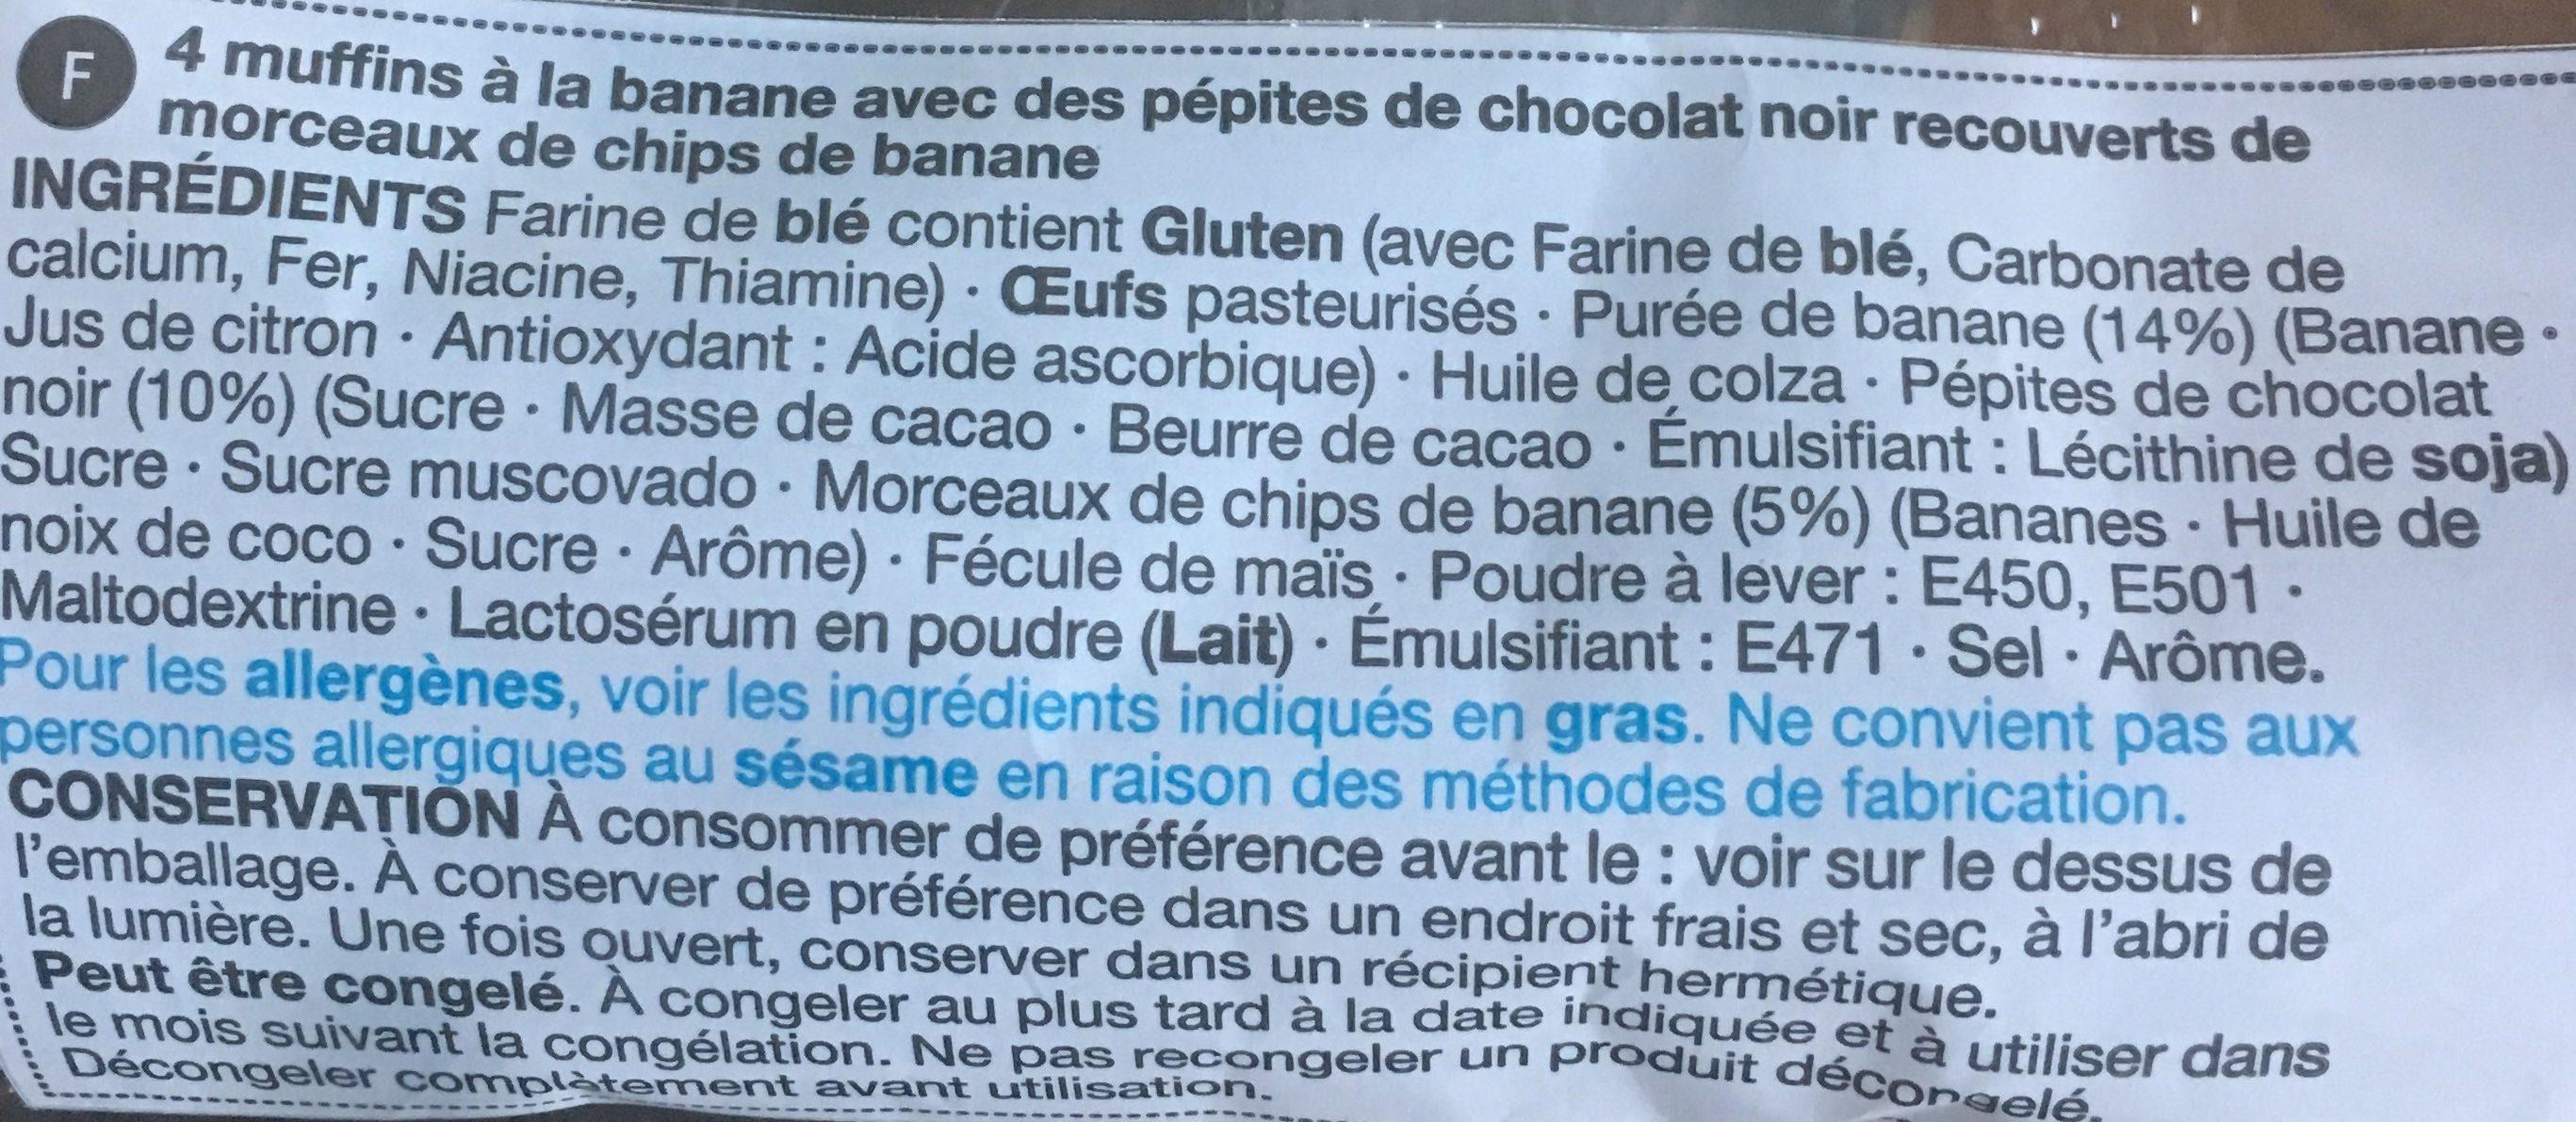 Banana & Chocolate chip Muffins - Ingredients - fr